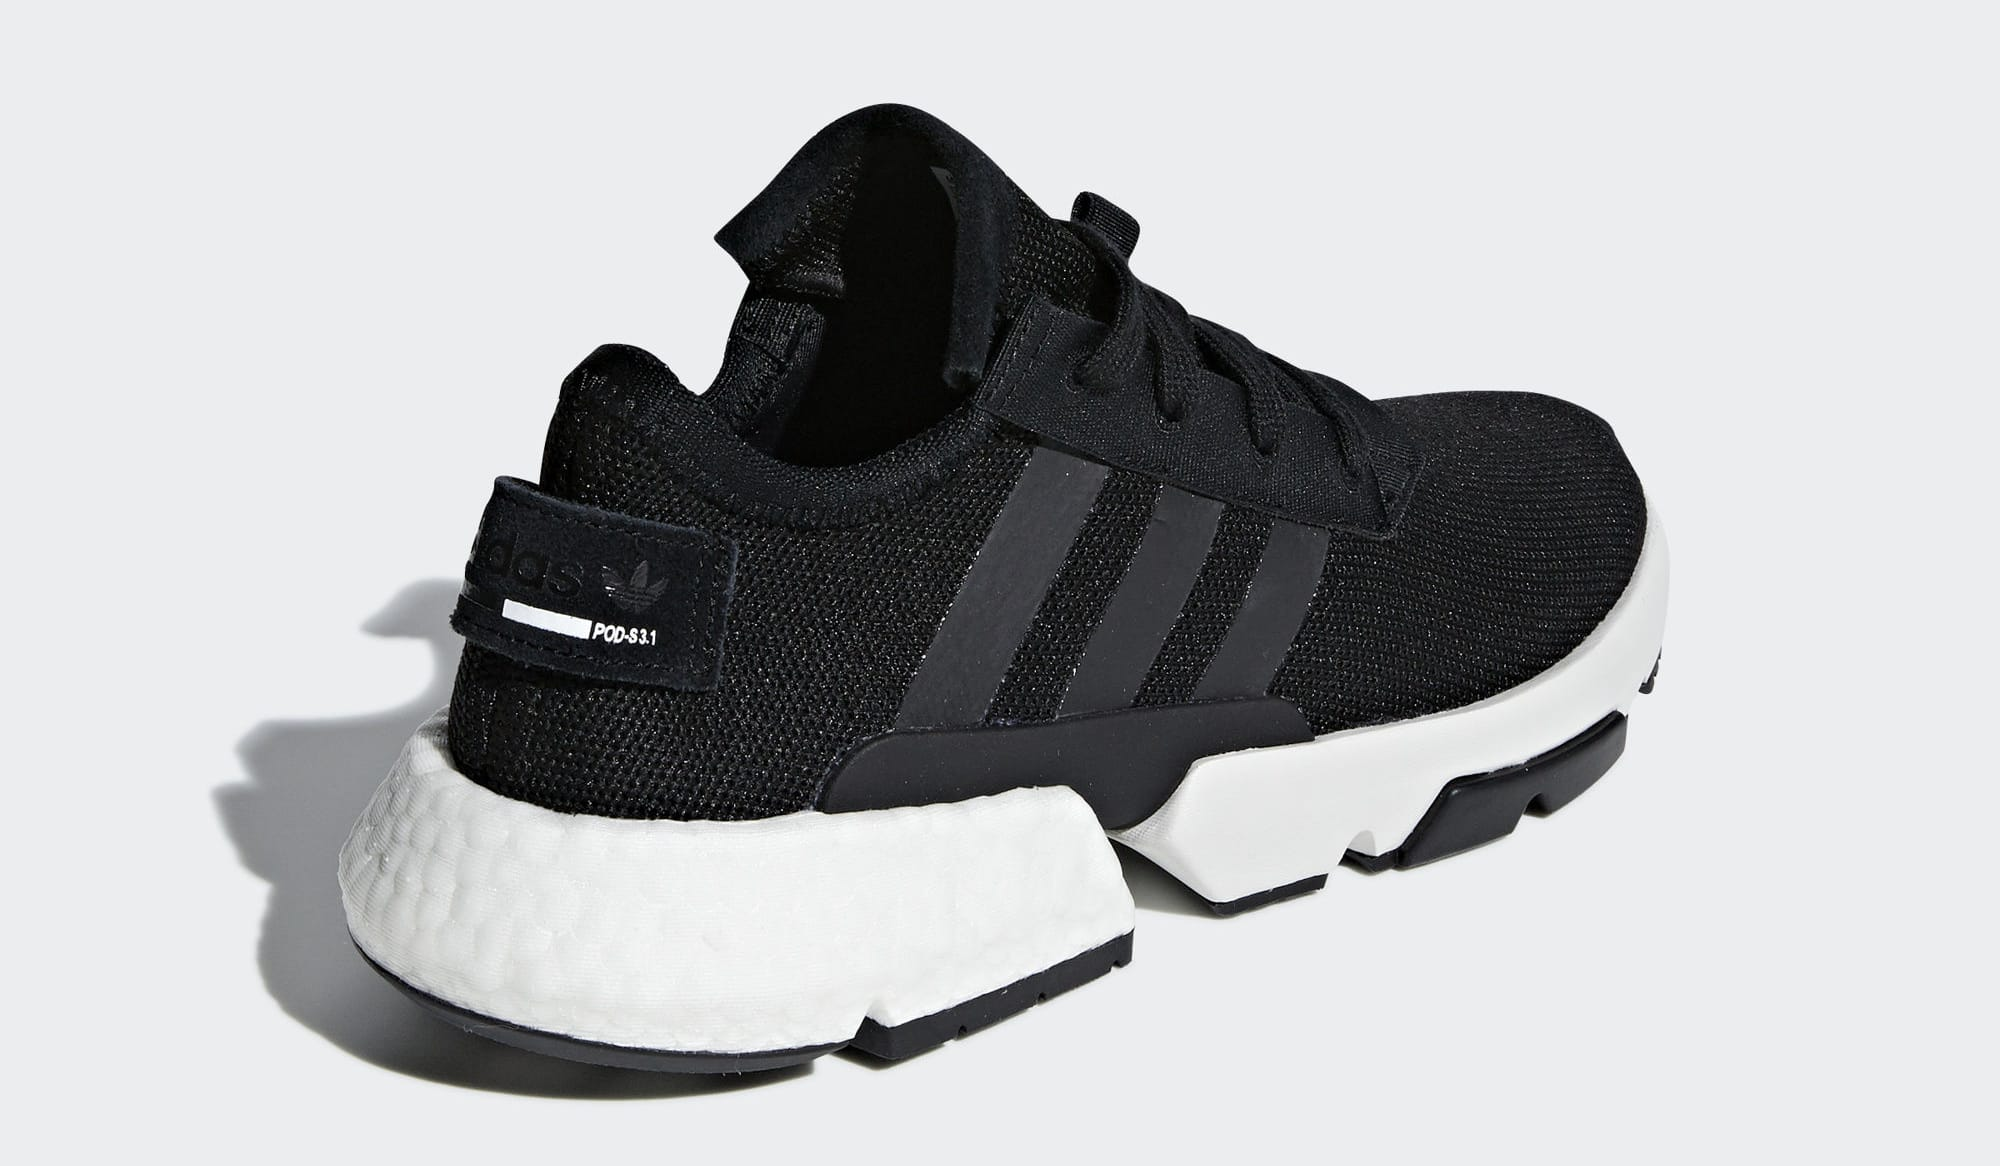 Adidas P.O.D. System Black/White B37366 (Heel)